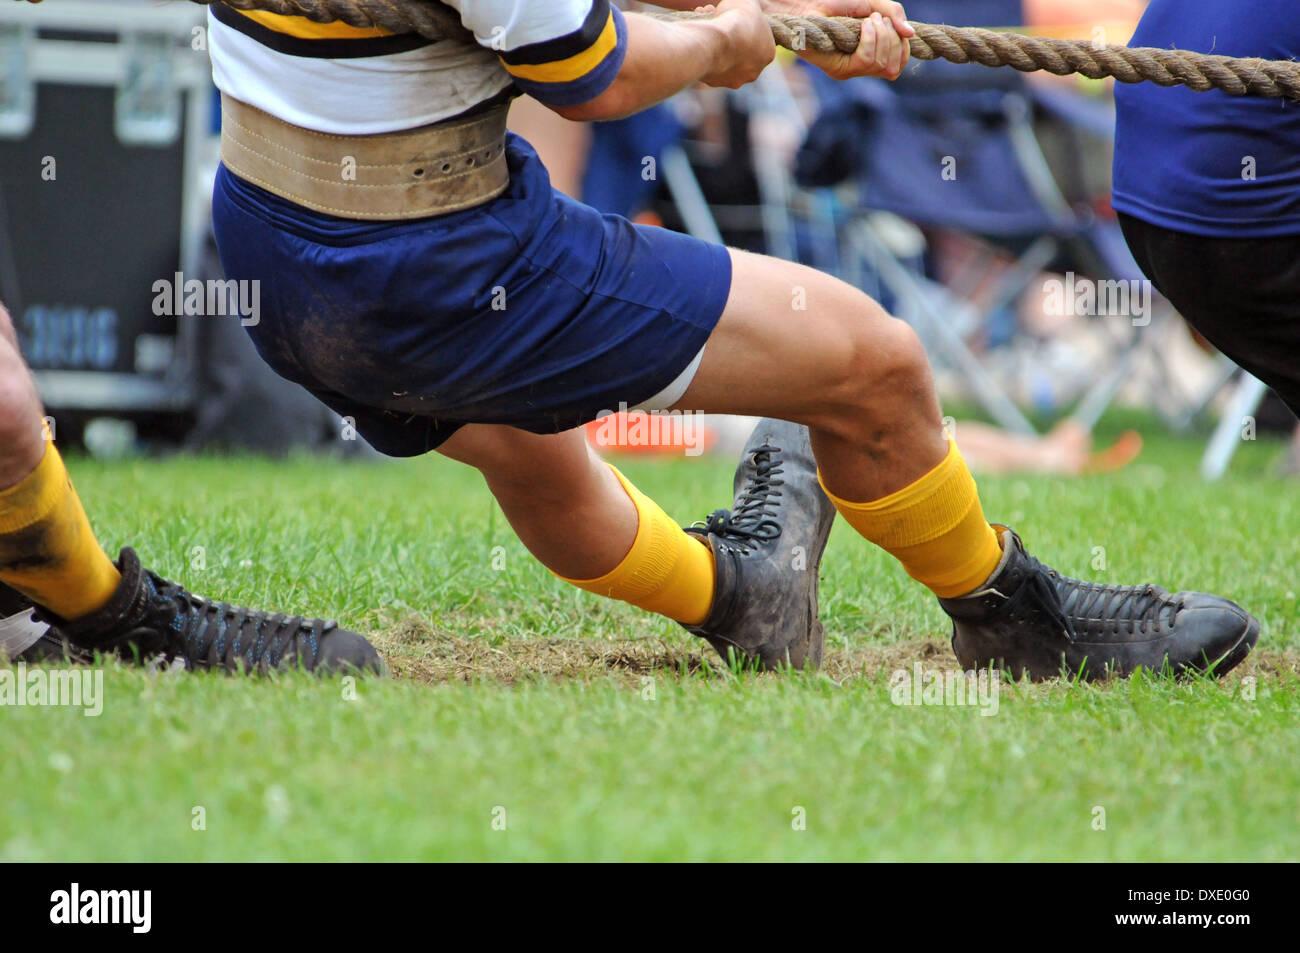 Tug-of-war, Sport, - Stock Image